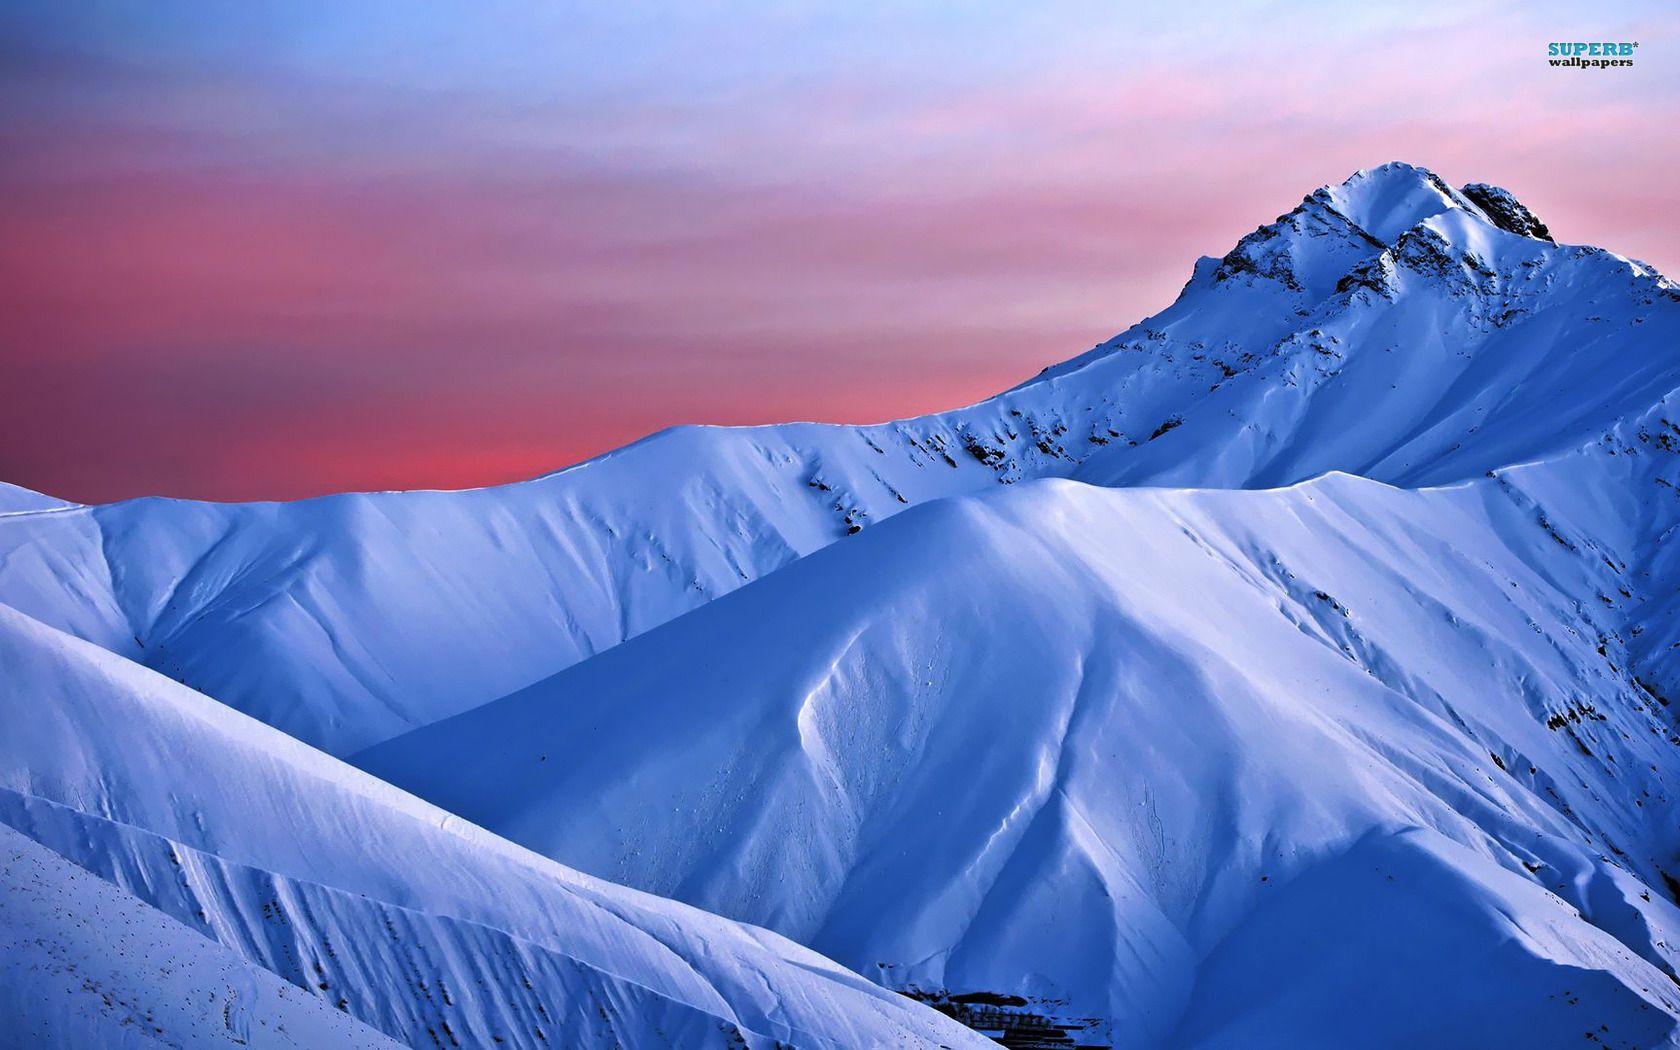 Snowy Mountans Snowy Mountains Wallpaper Nature Wallpapers 15711 Mountain Wallpaper Mountains Snowy Mountains